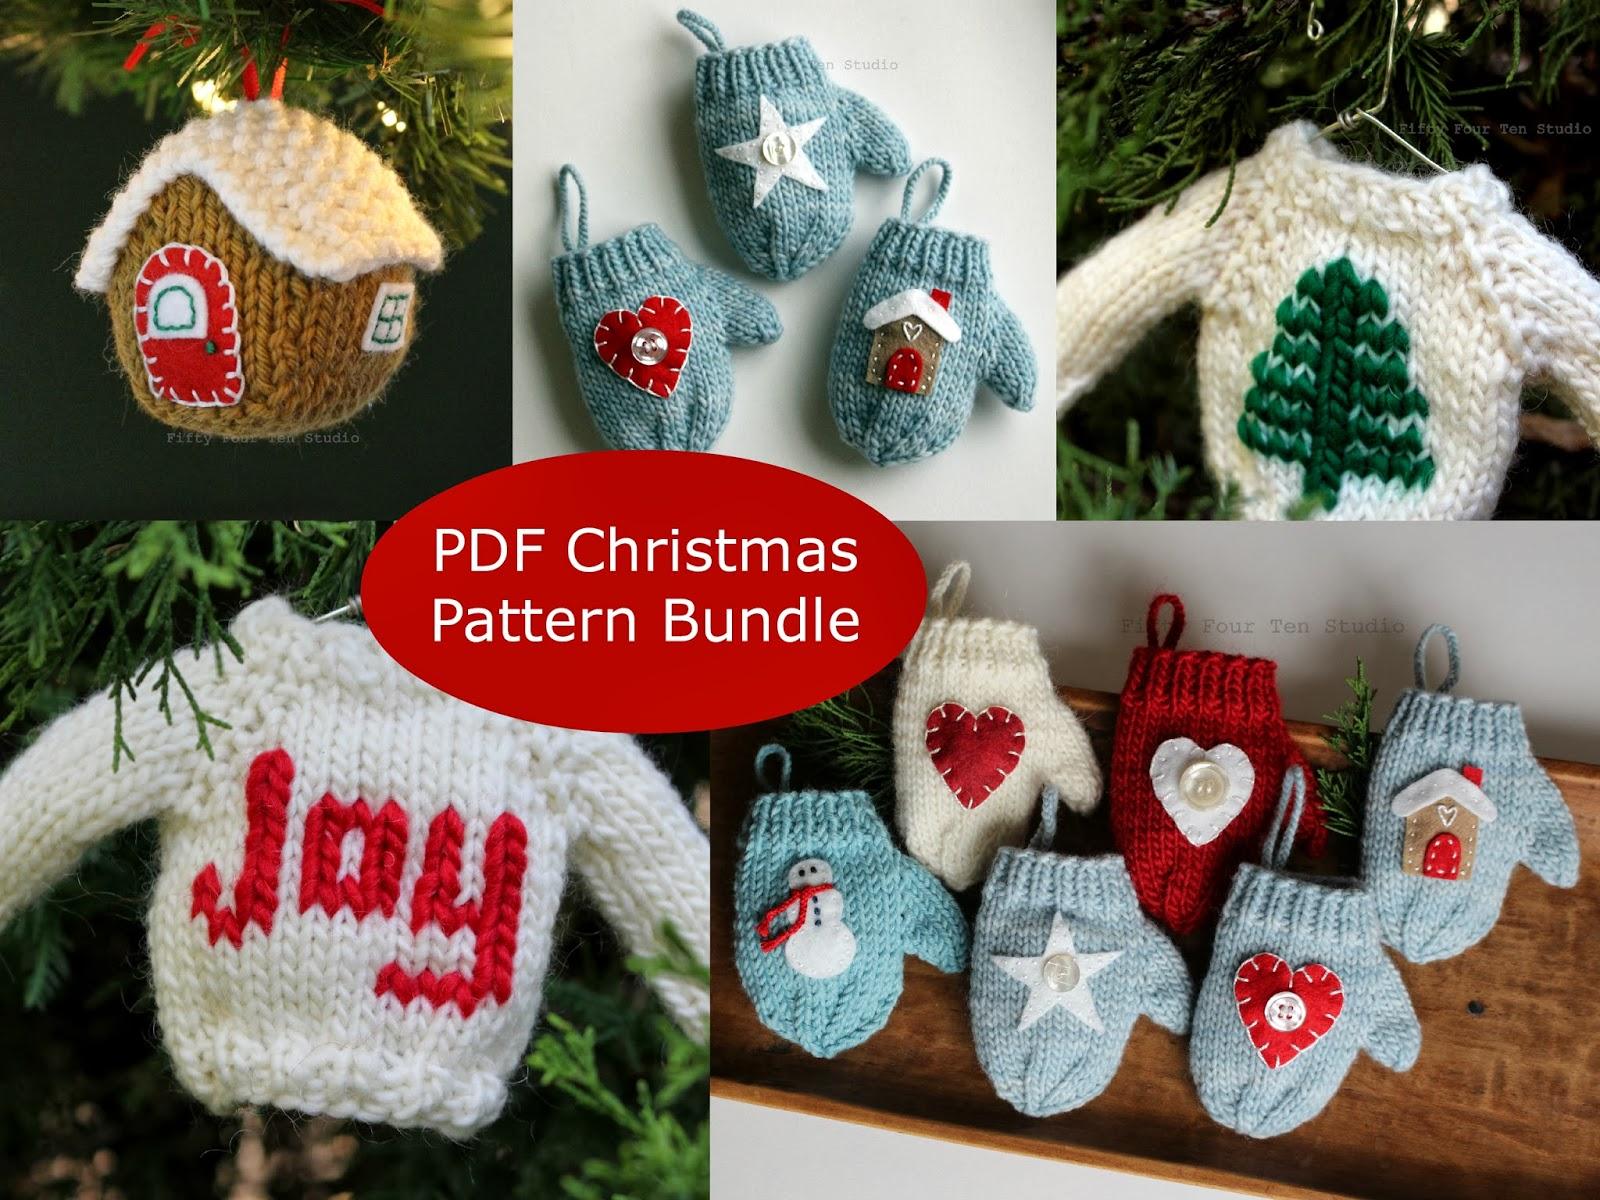 Fifty Four Ten Studio: Knitting Patterns